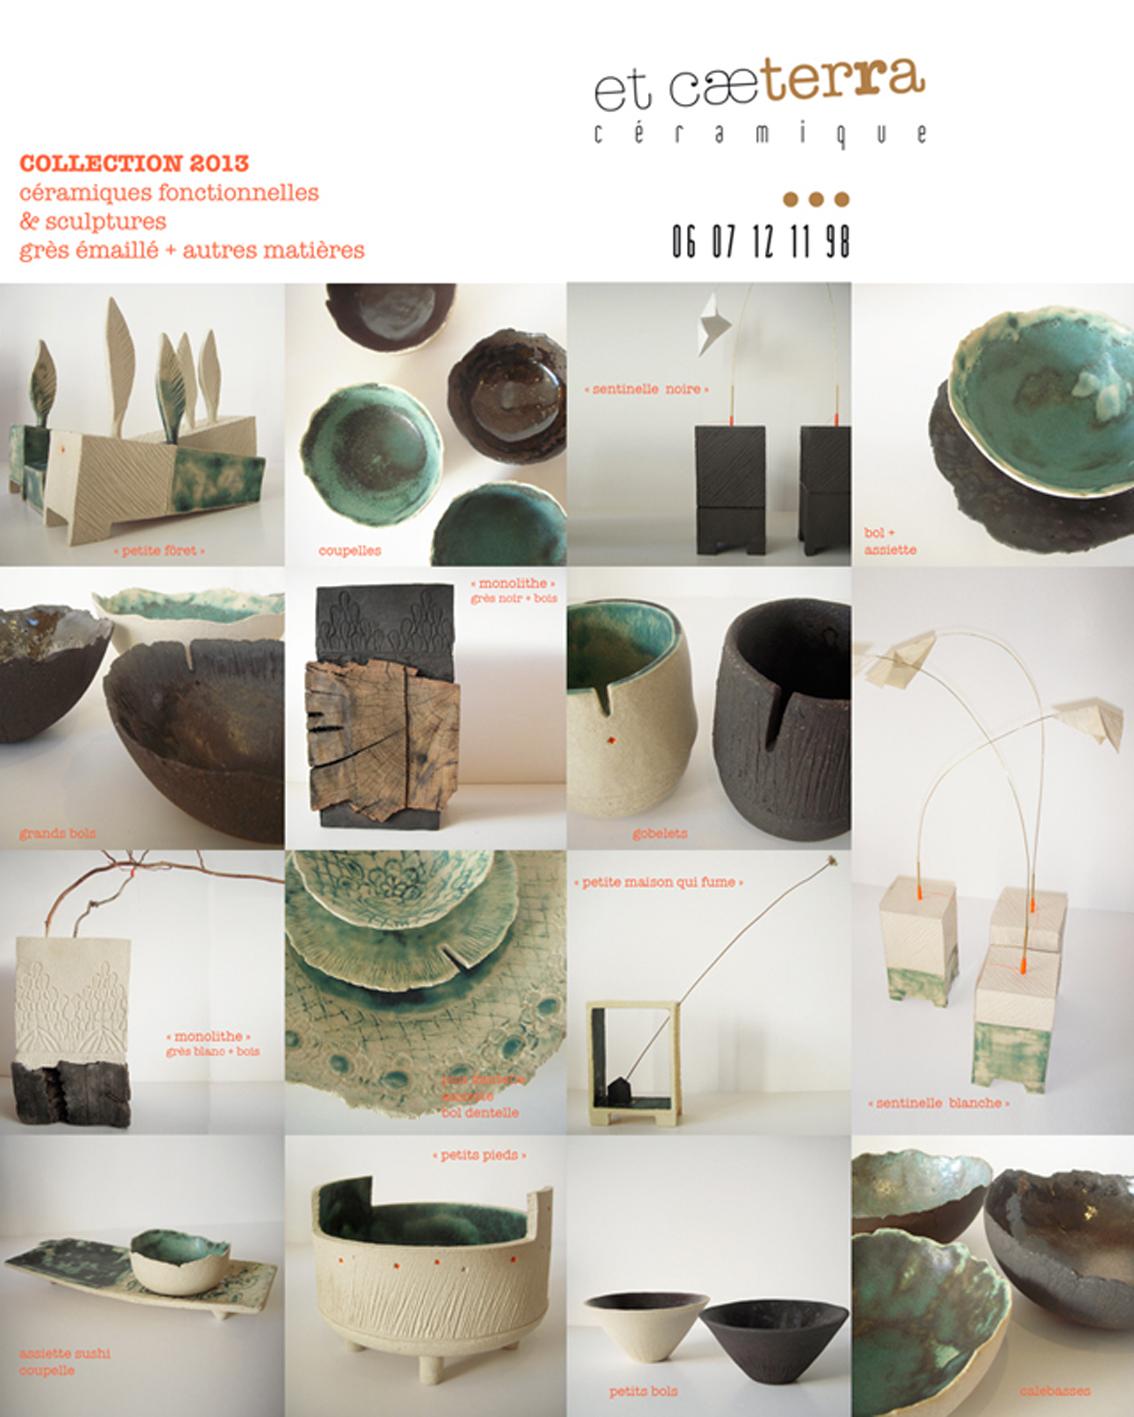 et ceaterra gamme2013-02-blog